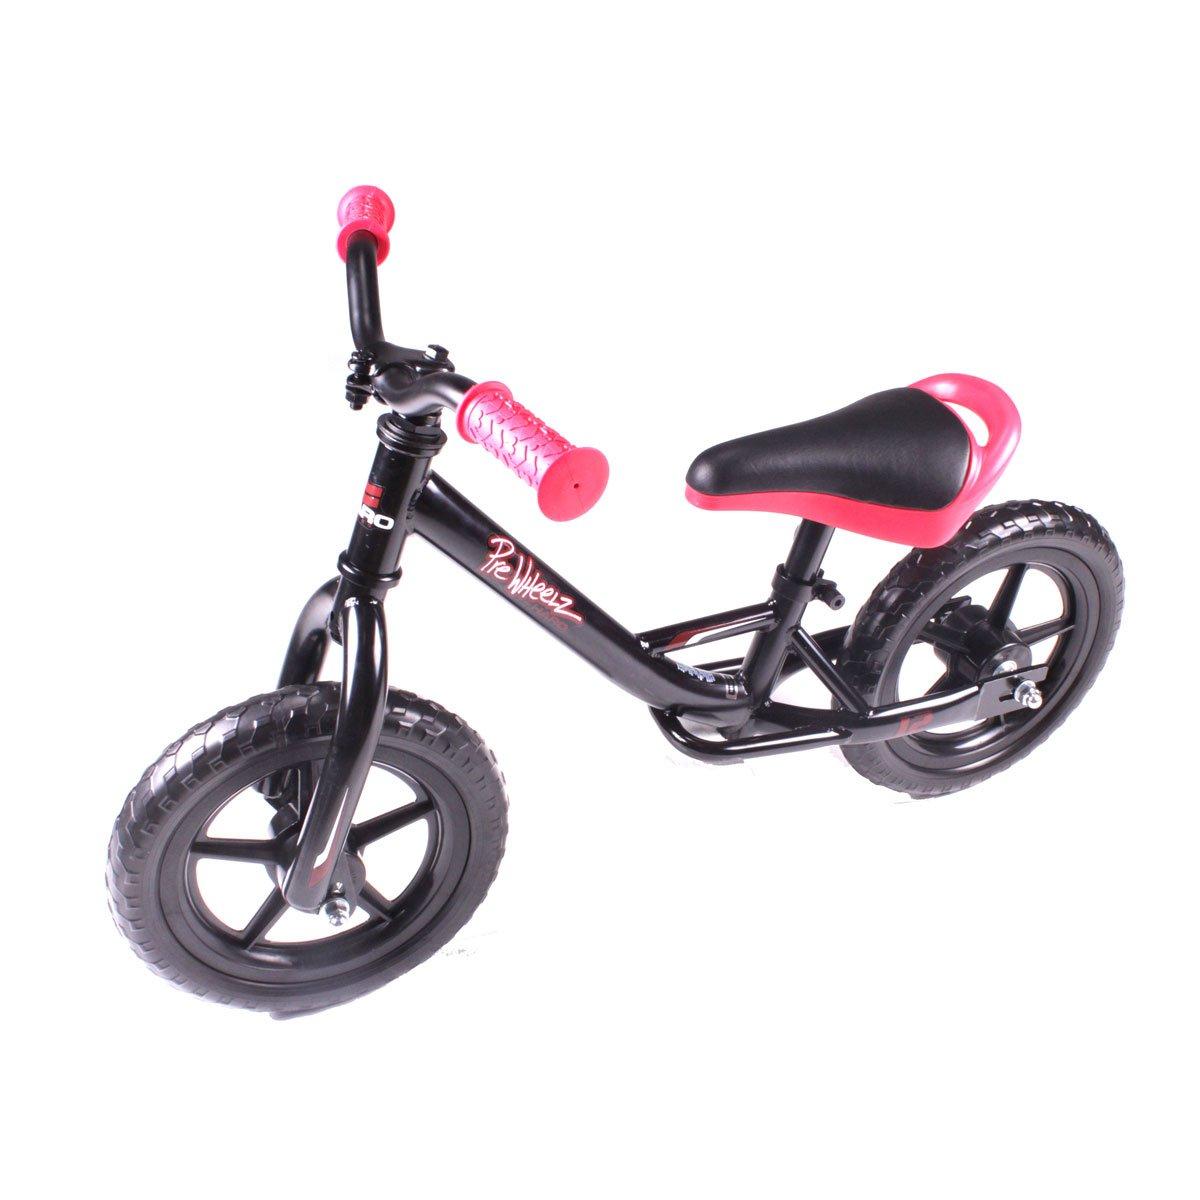 Haro PreWheelz 12 子供用二輪車ブラック B01F7M7HT2